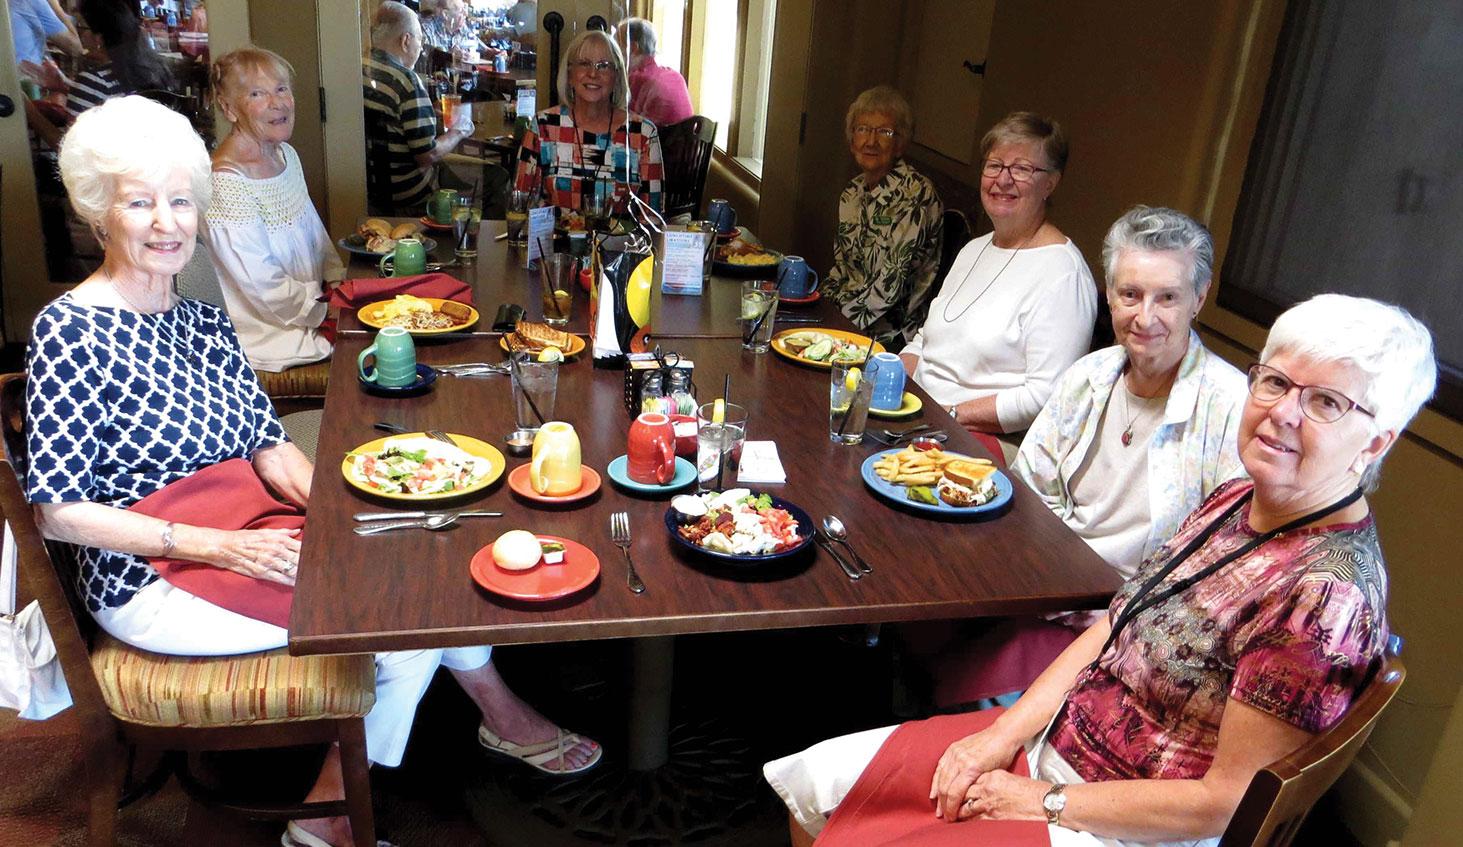 These happy Senior Village members enjoyed celebrating their birthdays together.